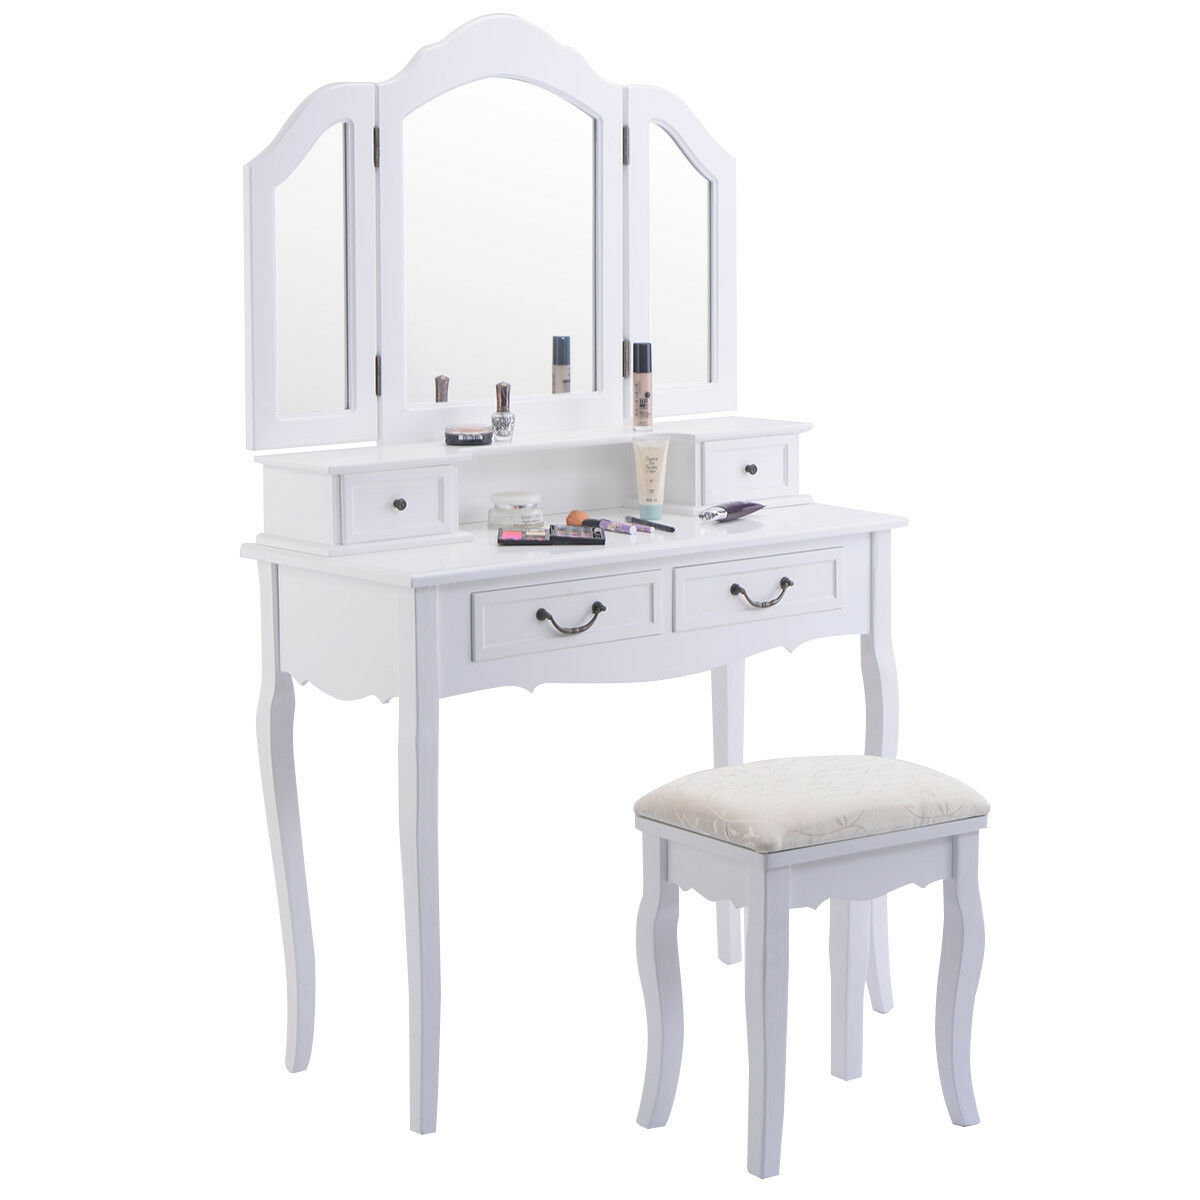 Merveilleux Tri Folding Mirror White Wood Vanity Set Makeup Bathroom Table Dresser 4  Drawers + Stool